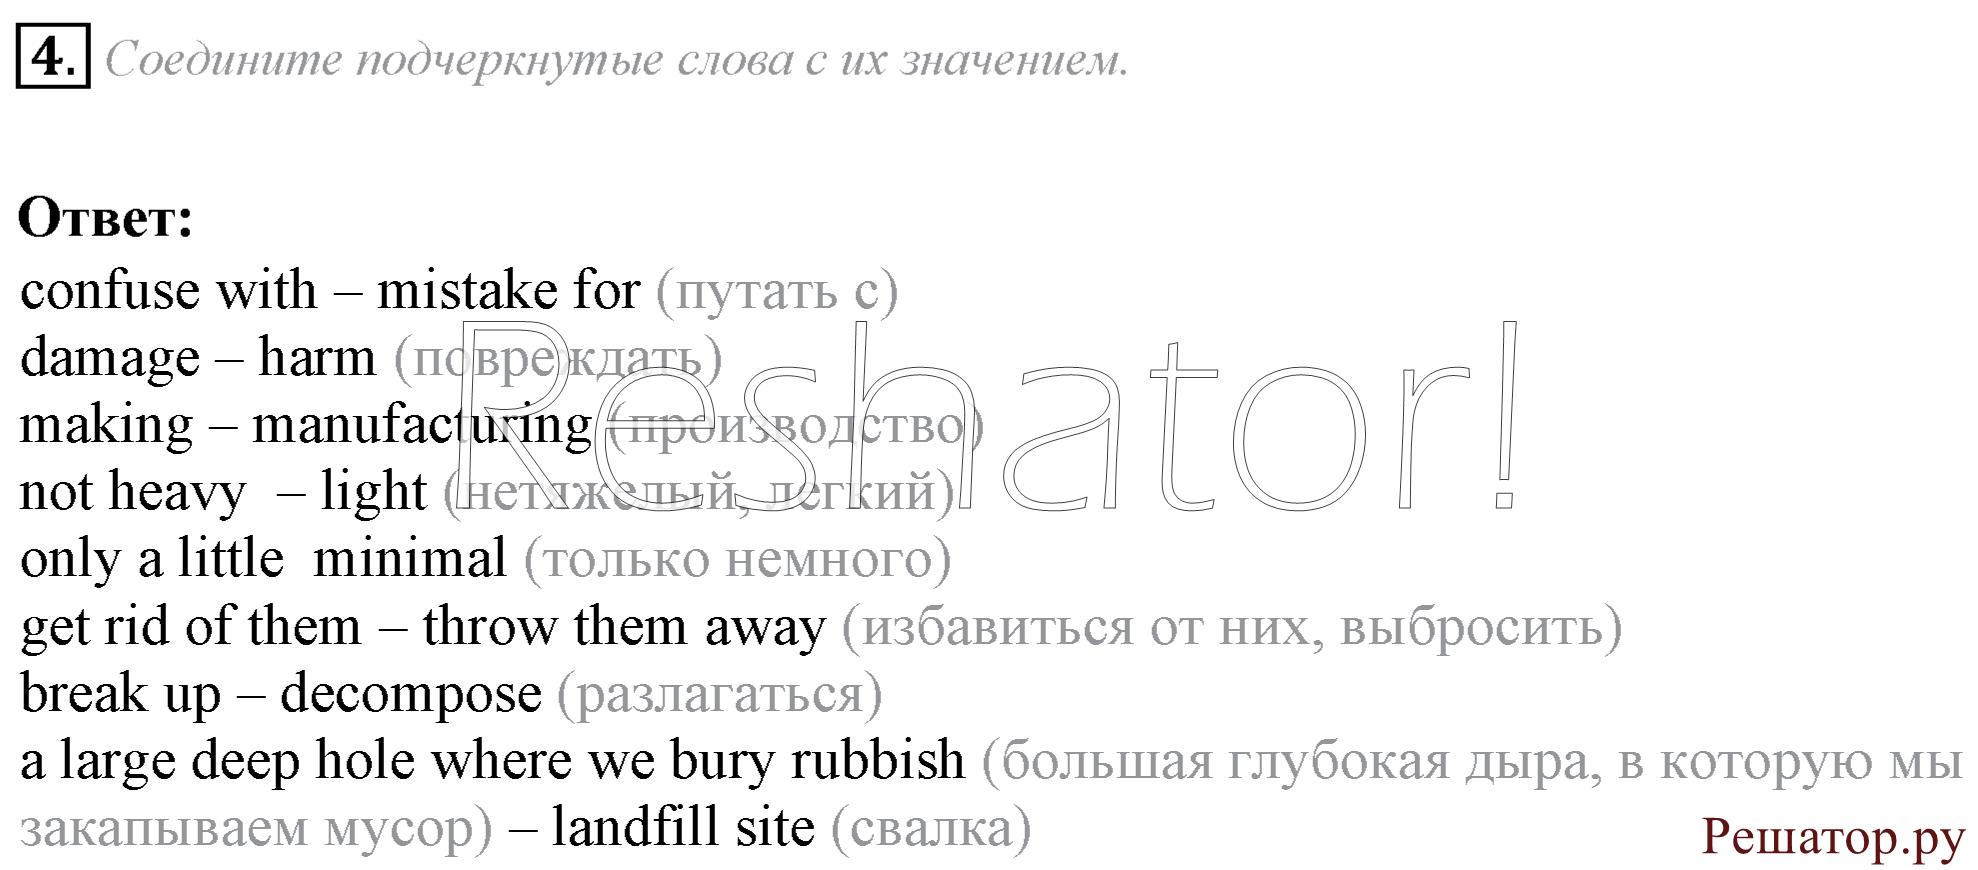 перевод дули по ваулина 8 текстов класс английскому гдз